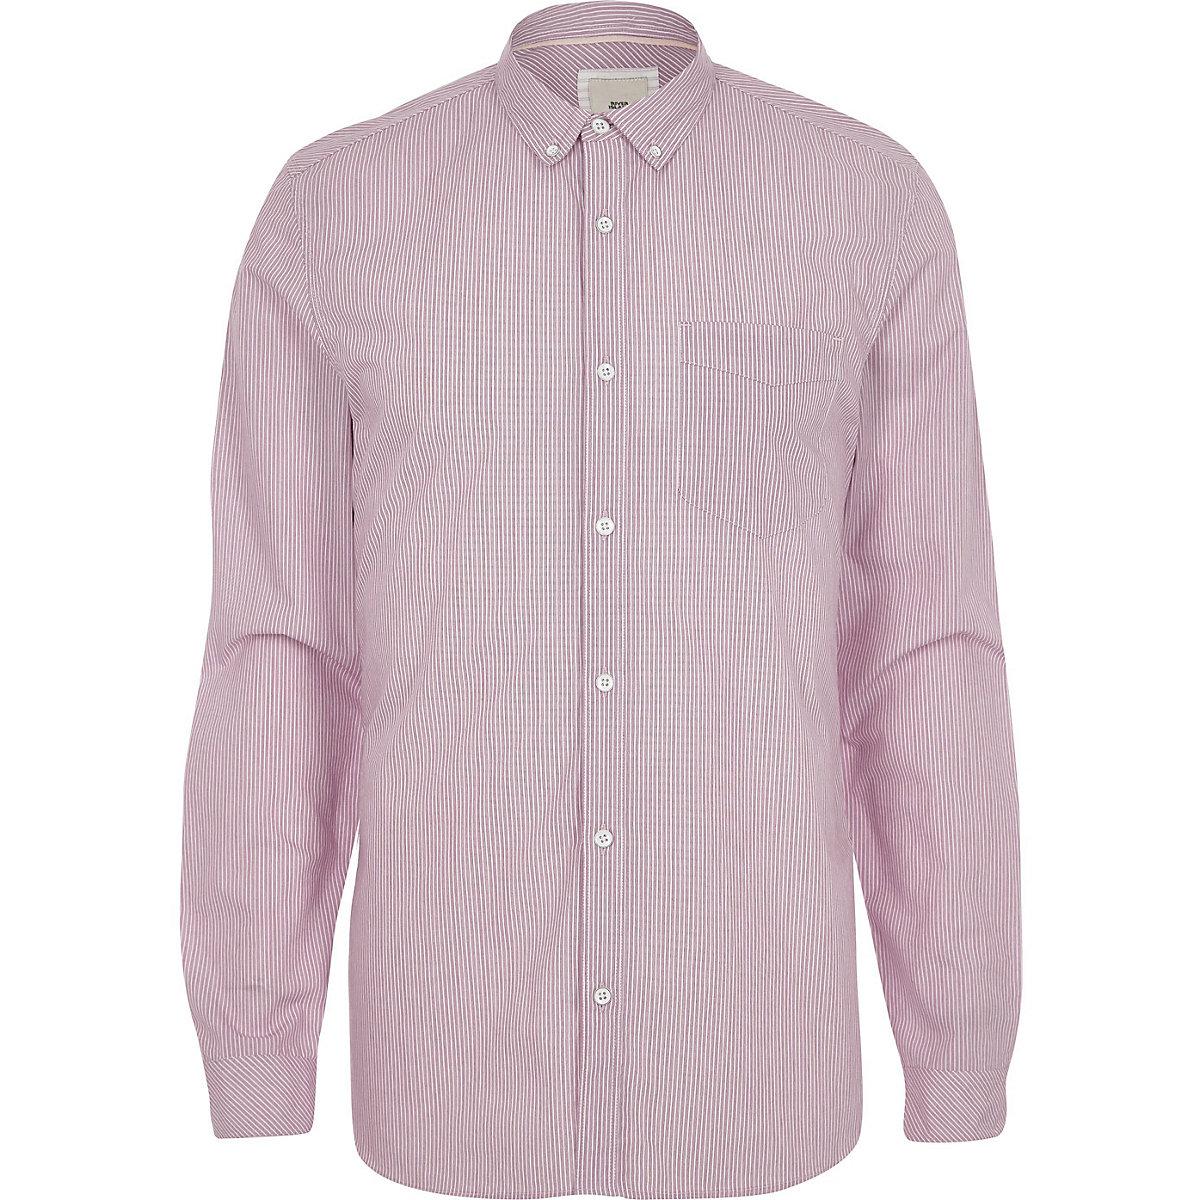 Red stripe slim fit long sleeve shirt